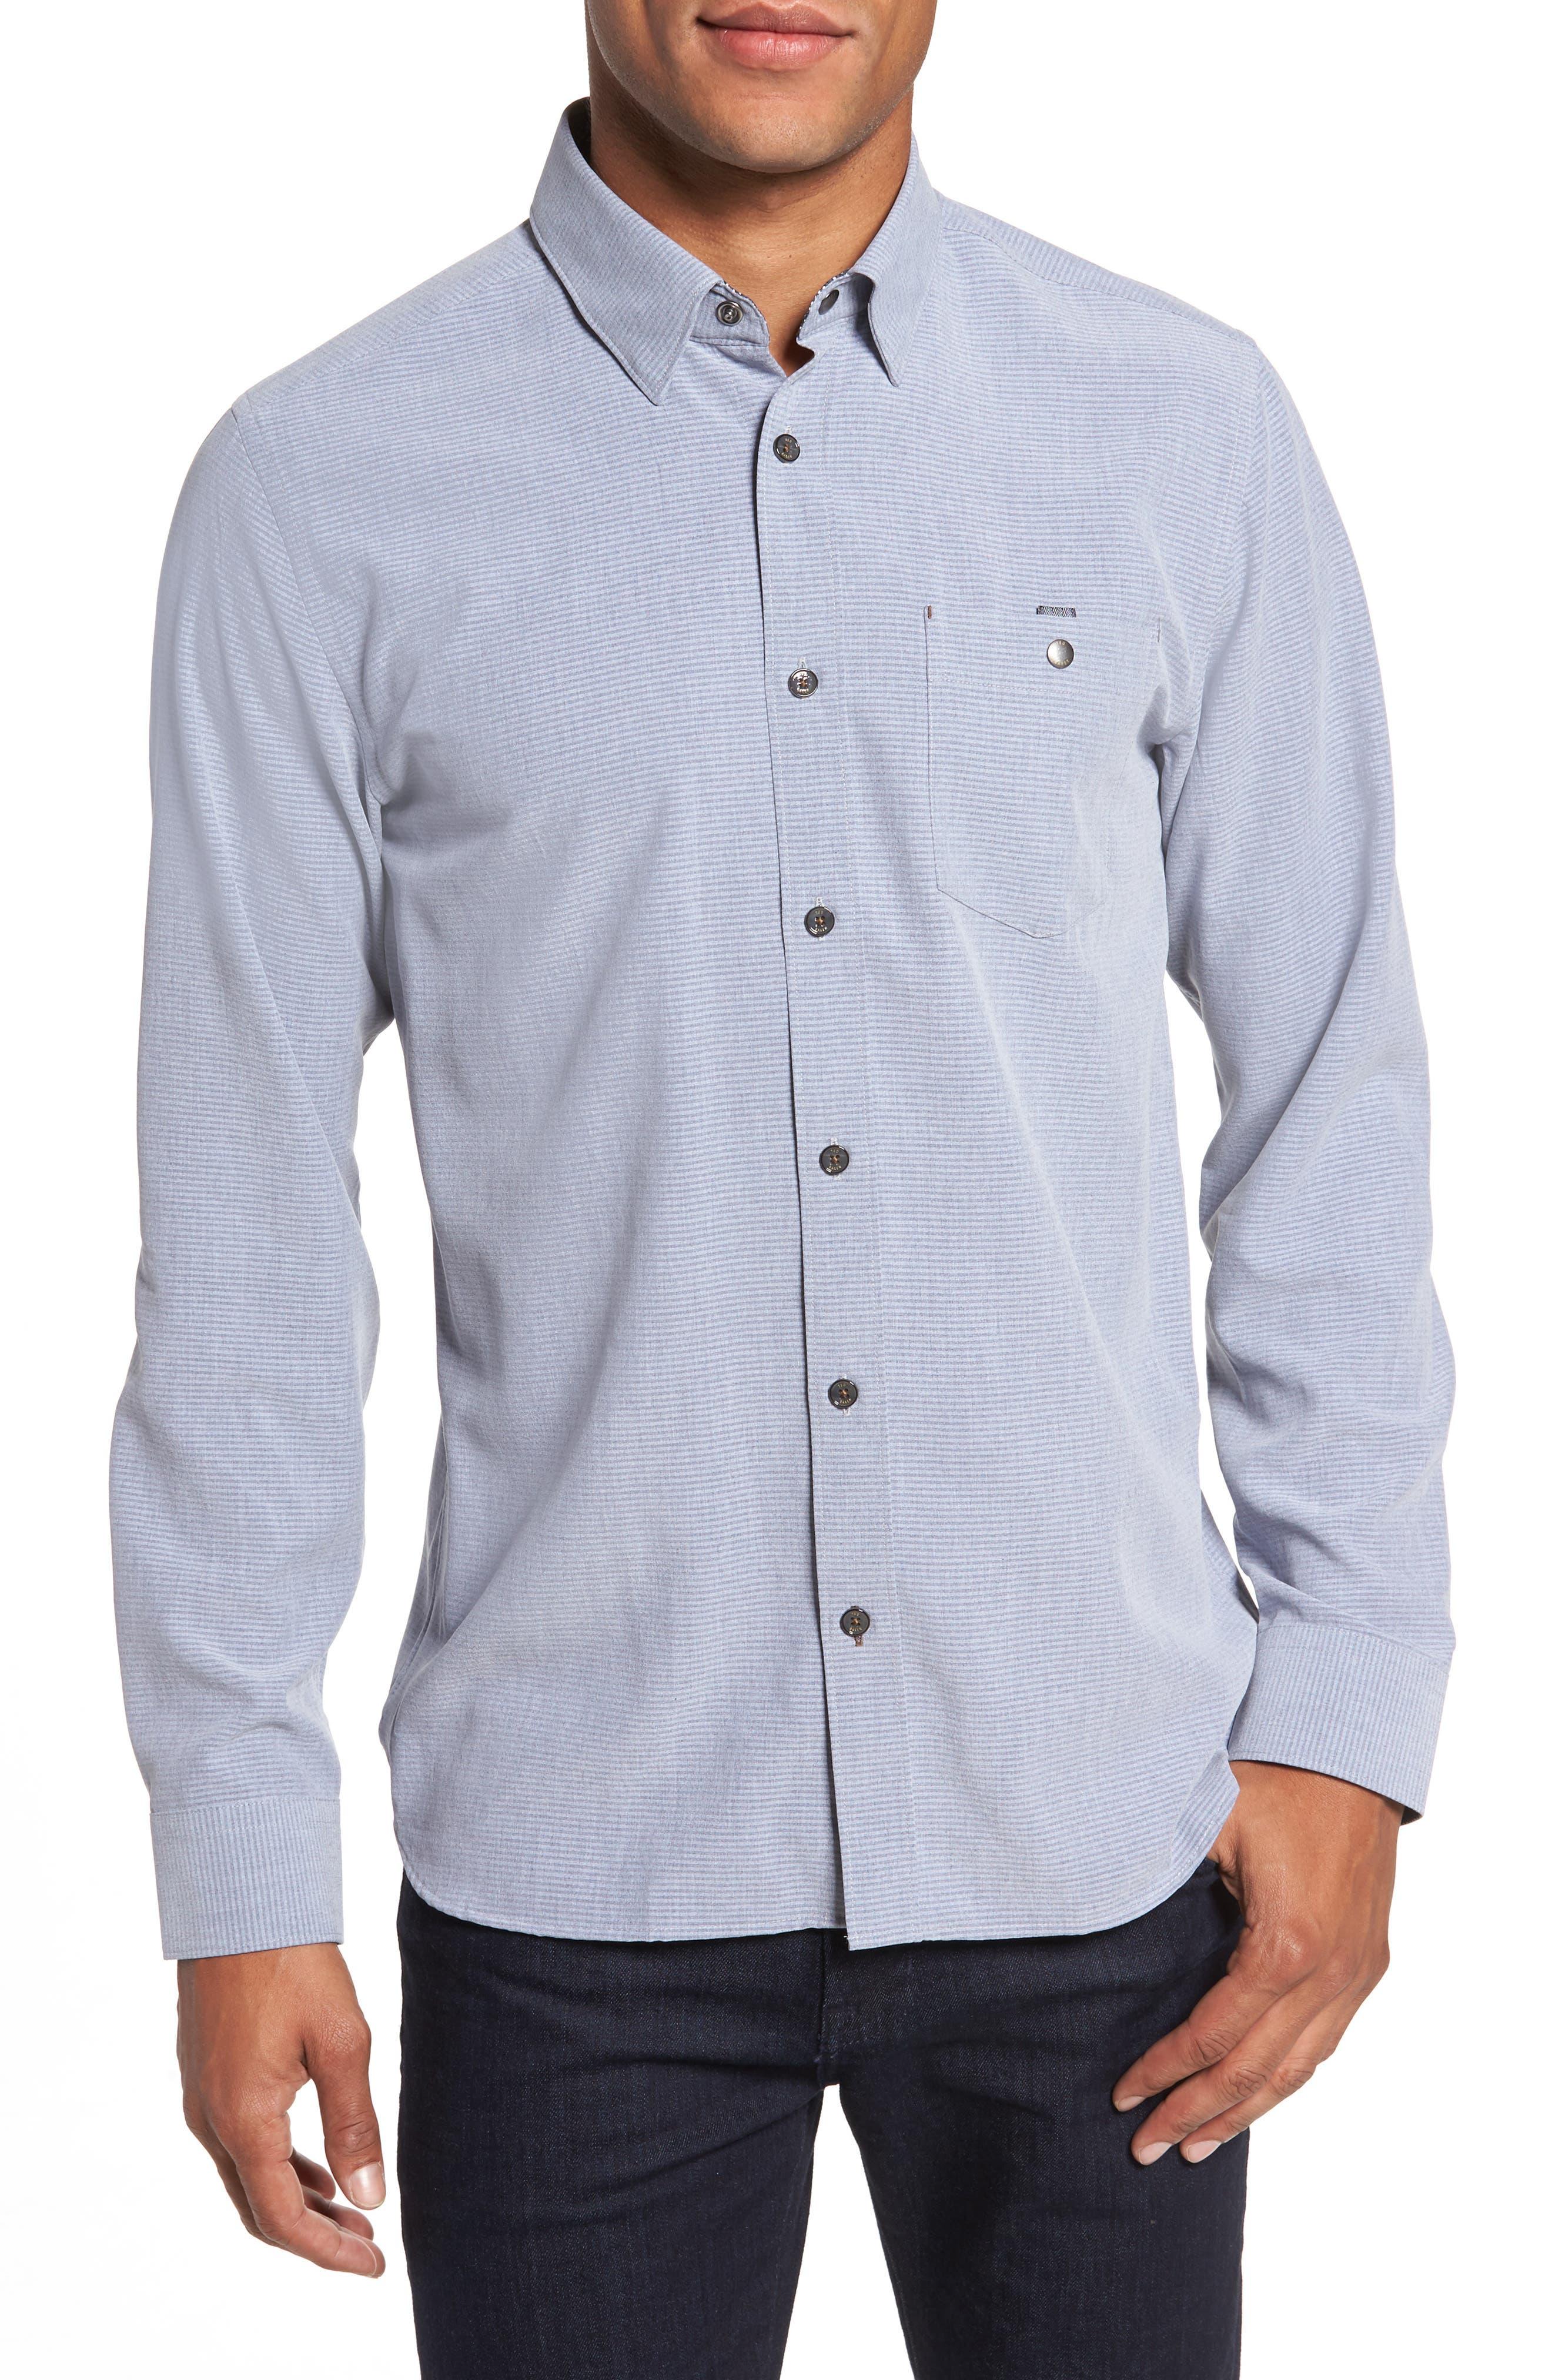 Main Image - Ted Baker London Mettro Slim Fit Horizontal Stripe Sport Shirt